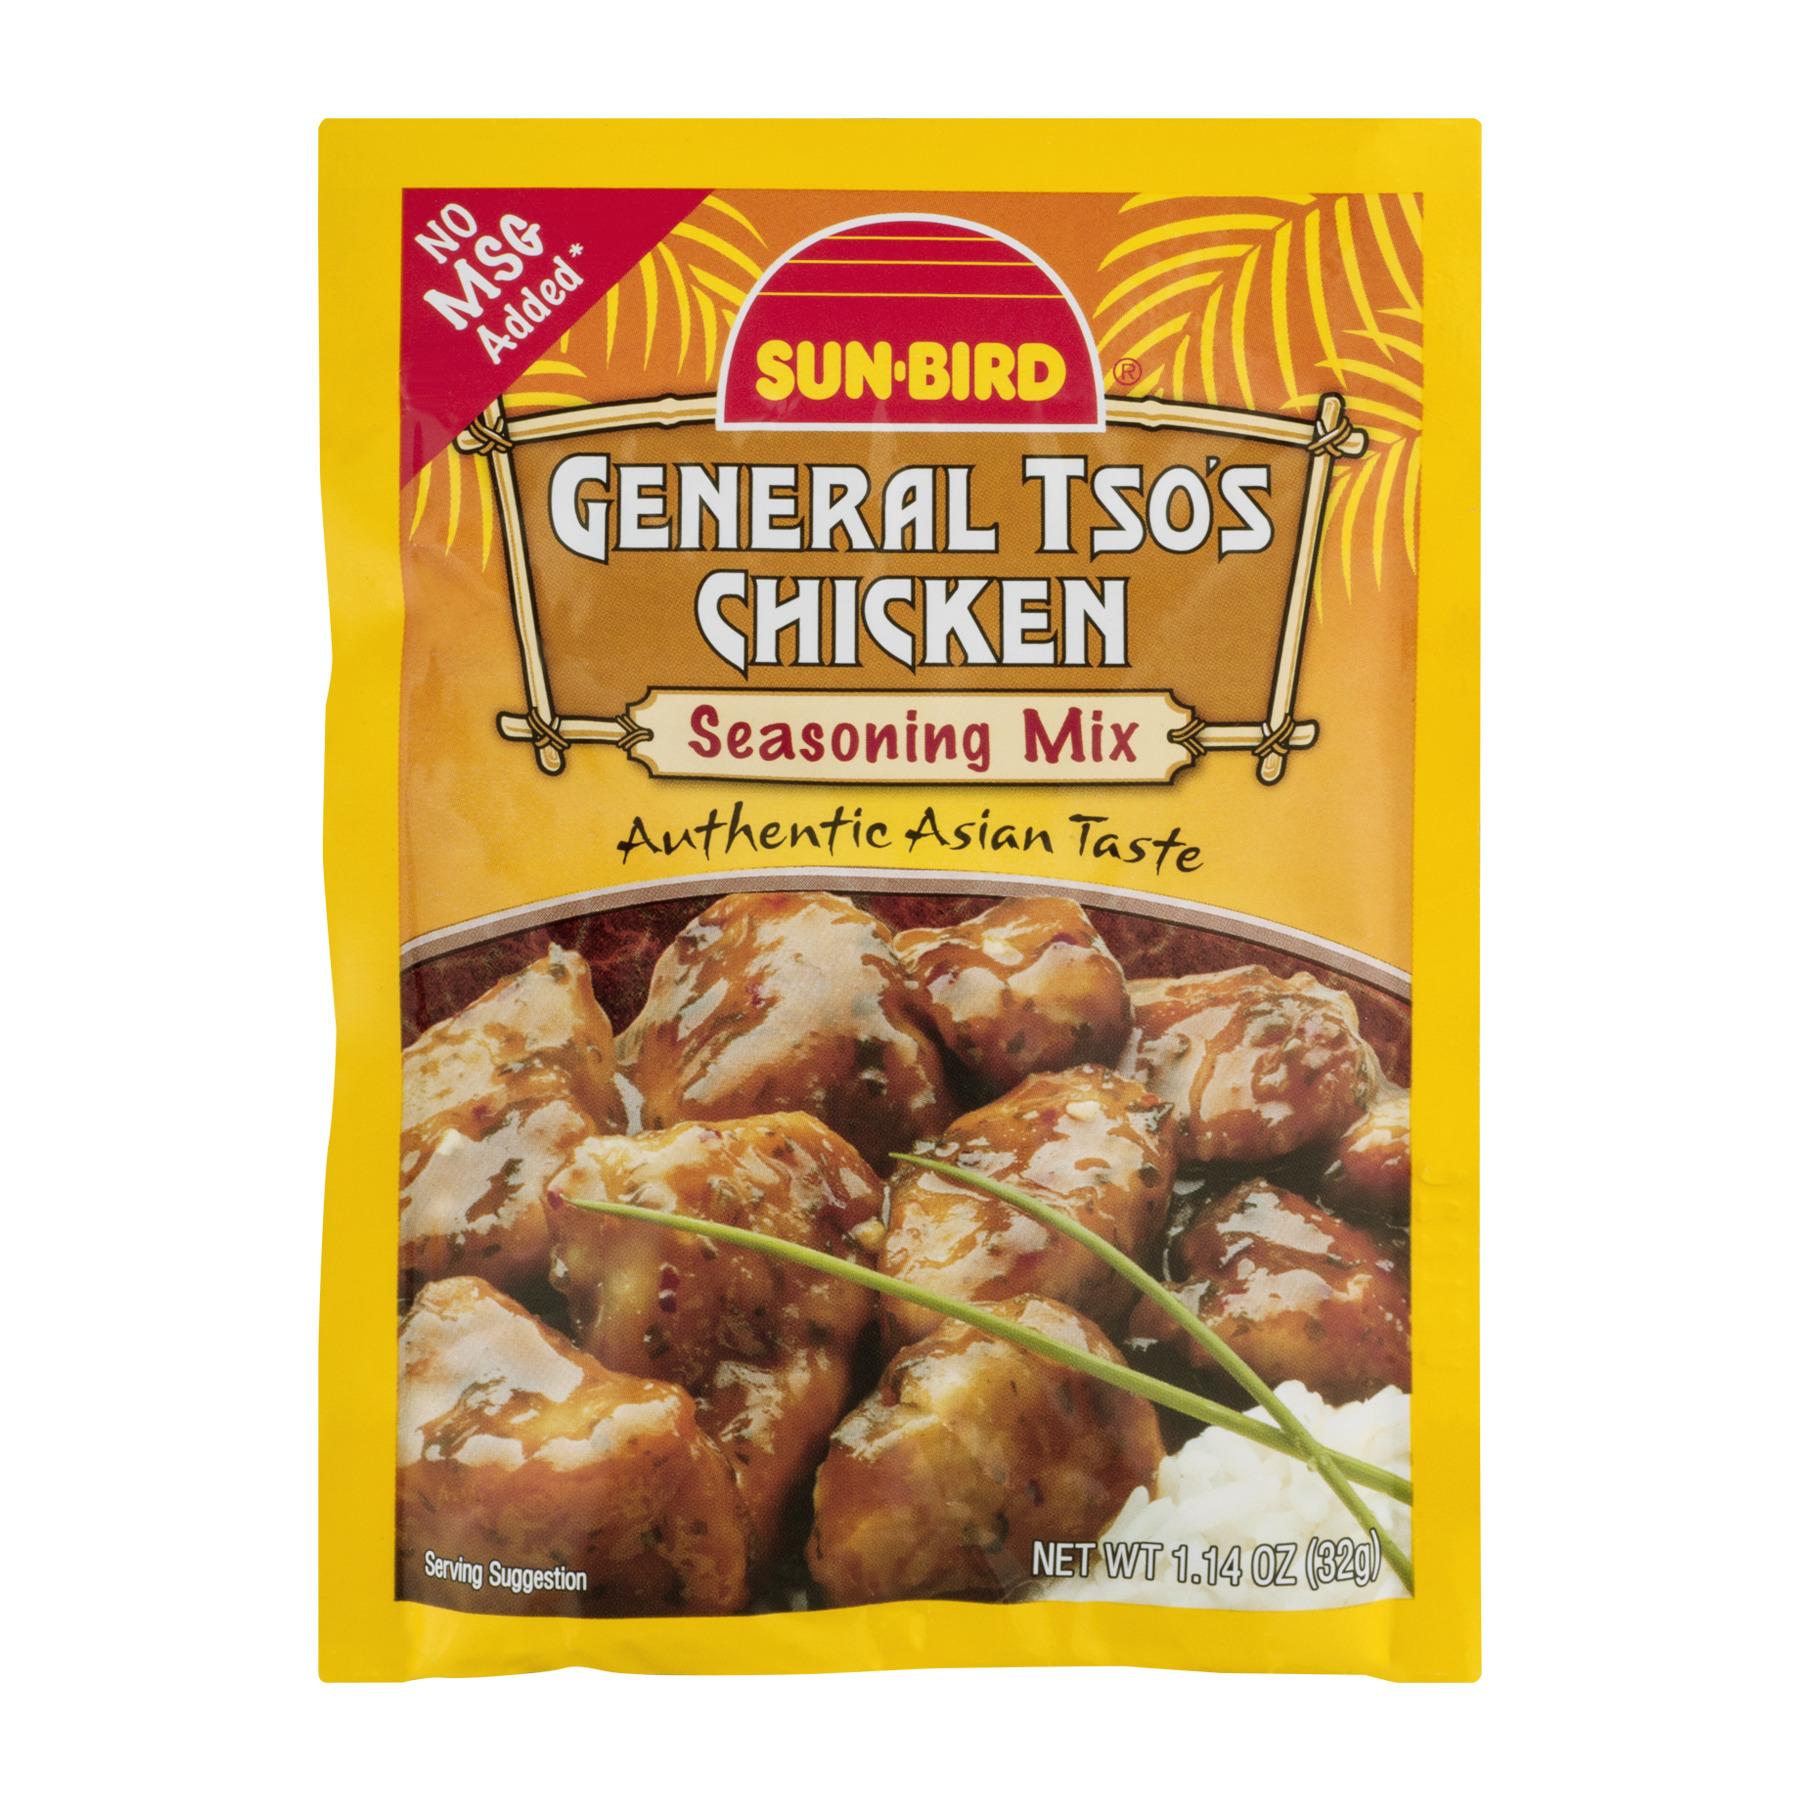 Sun-Bird General Tso's Chicken Seasoning Mix, 1.14 OZ